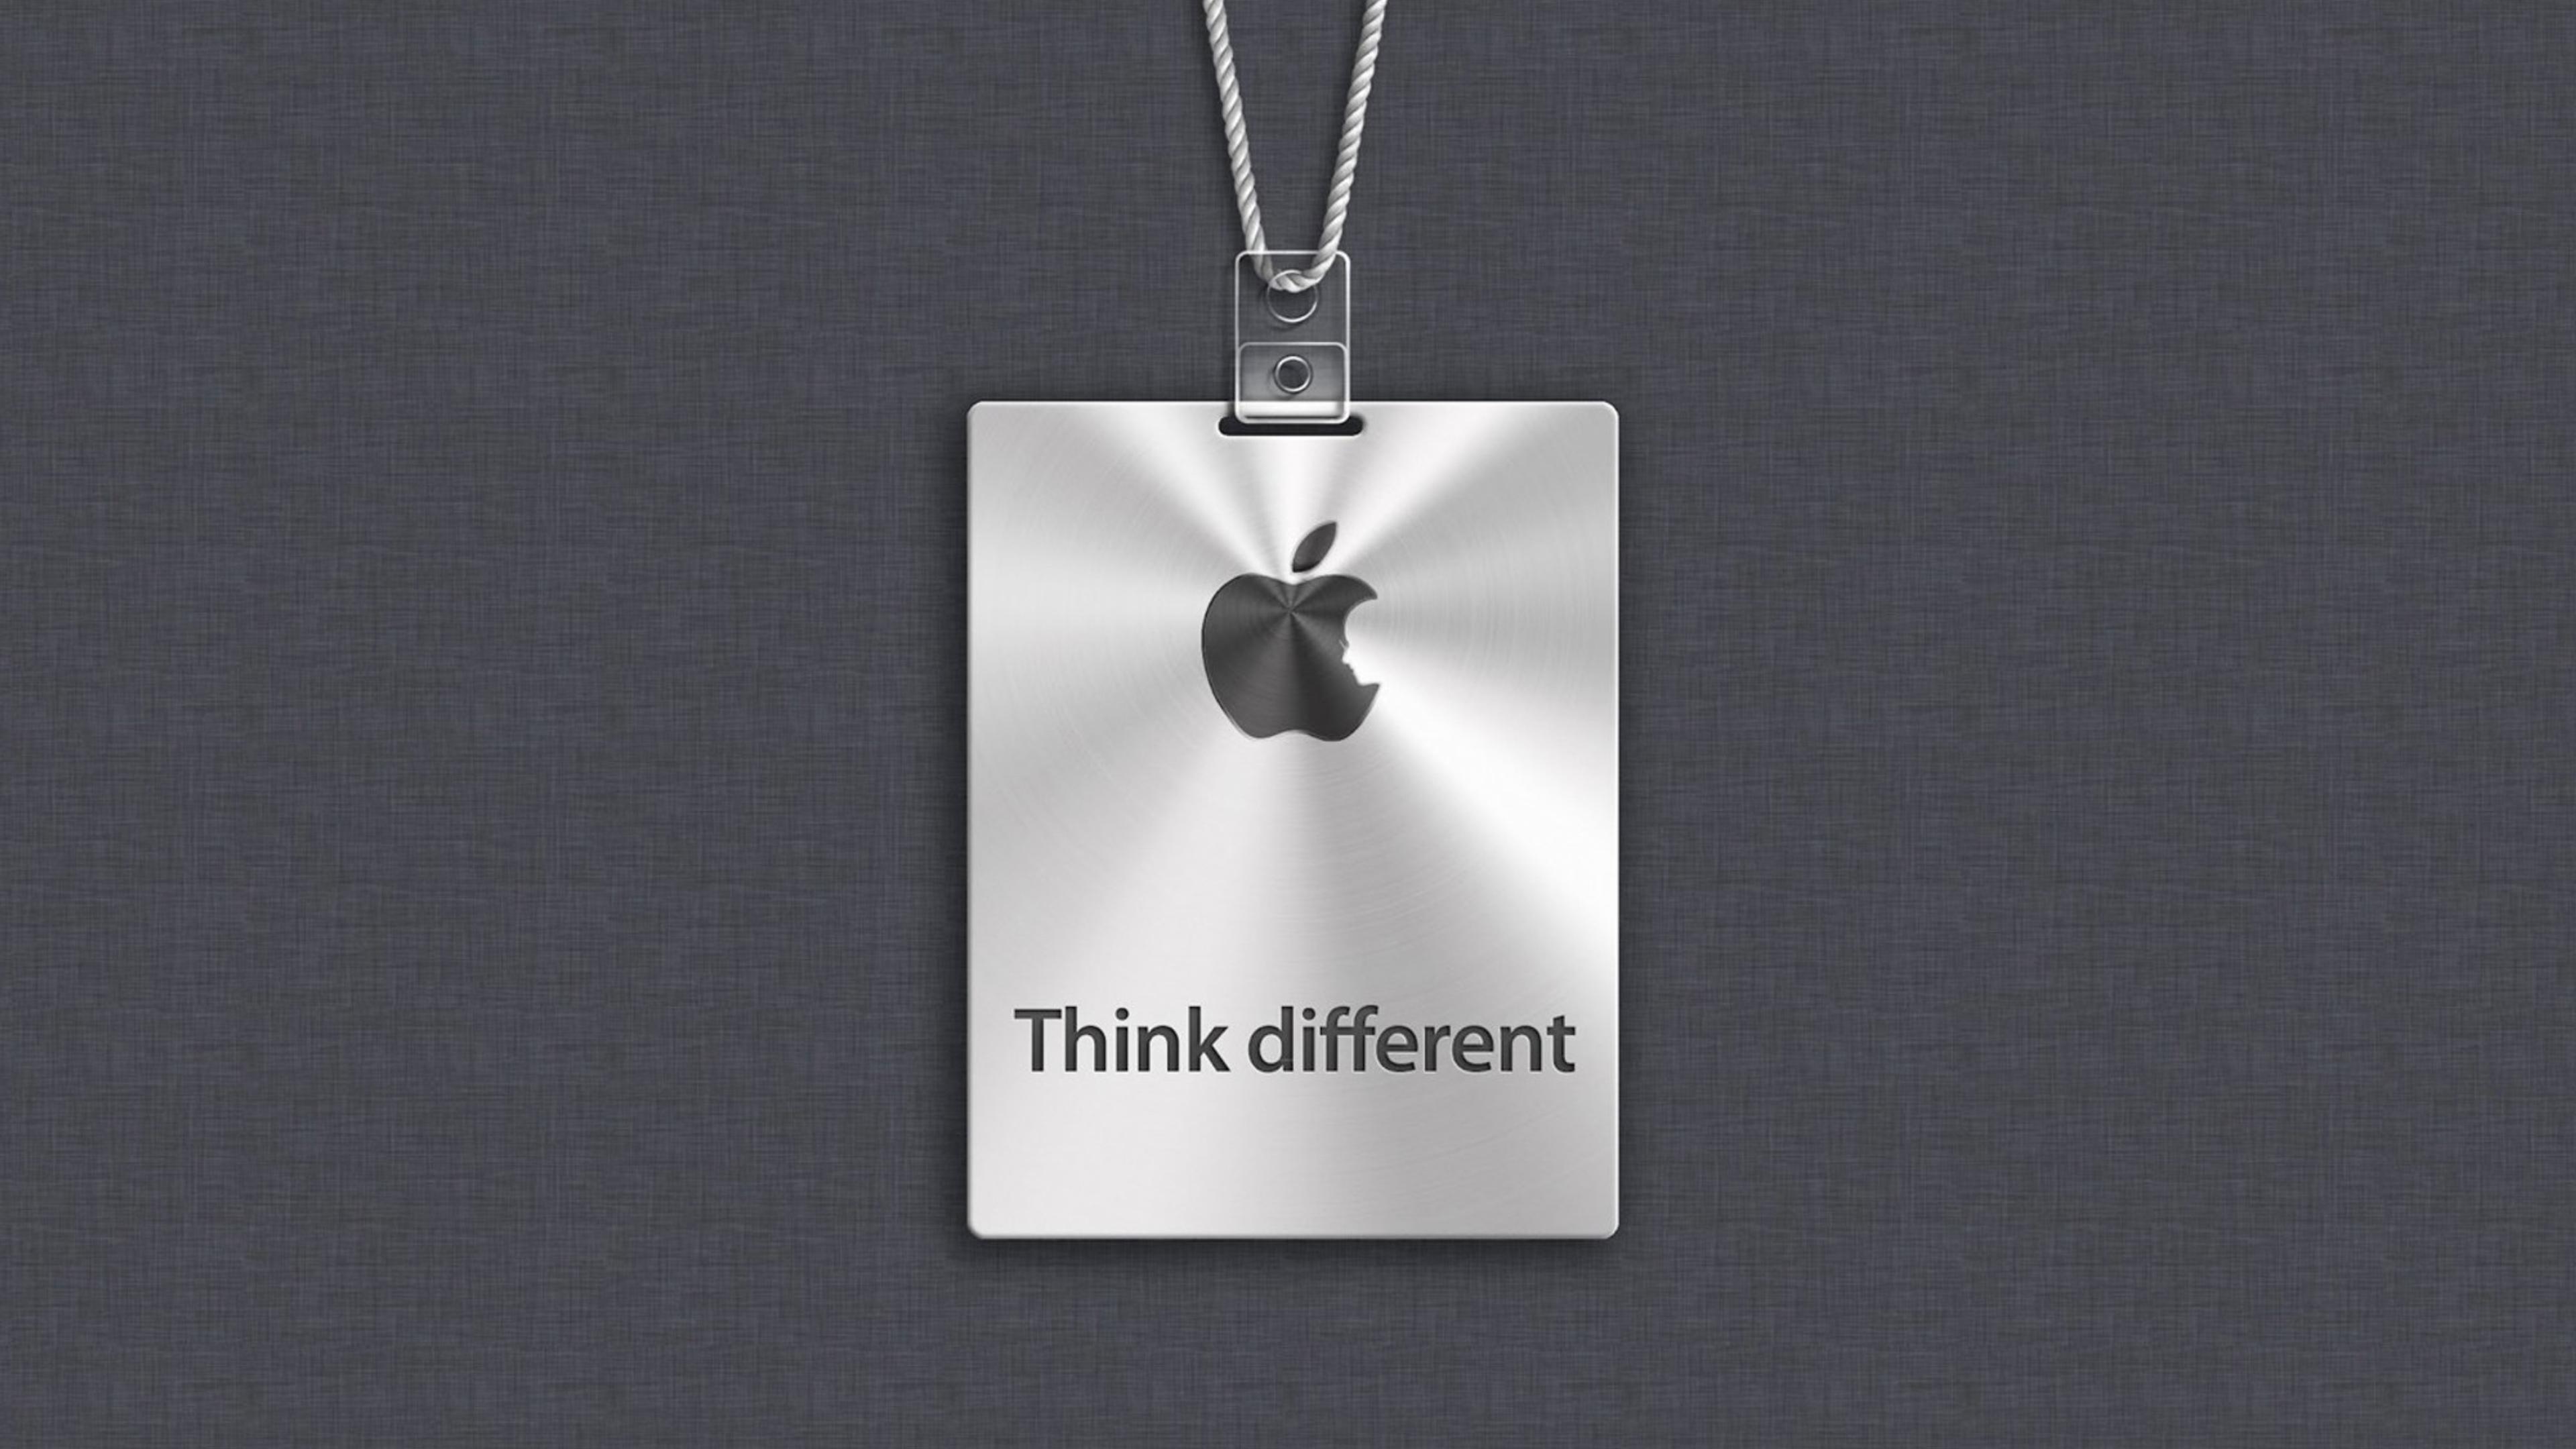 Apple Logo Think Different Hd Wallpaper